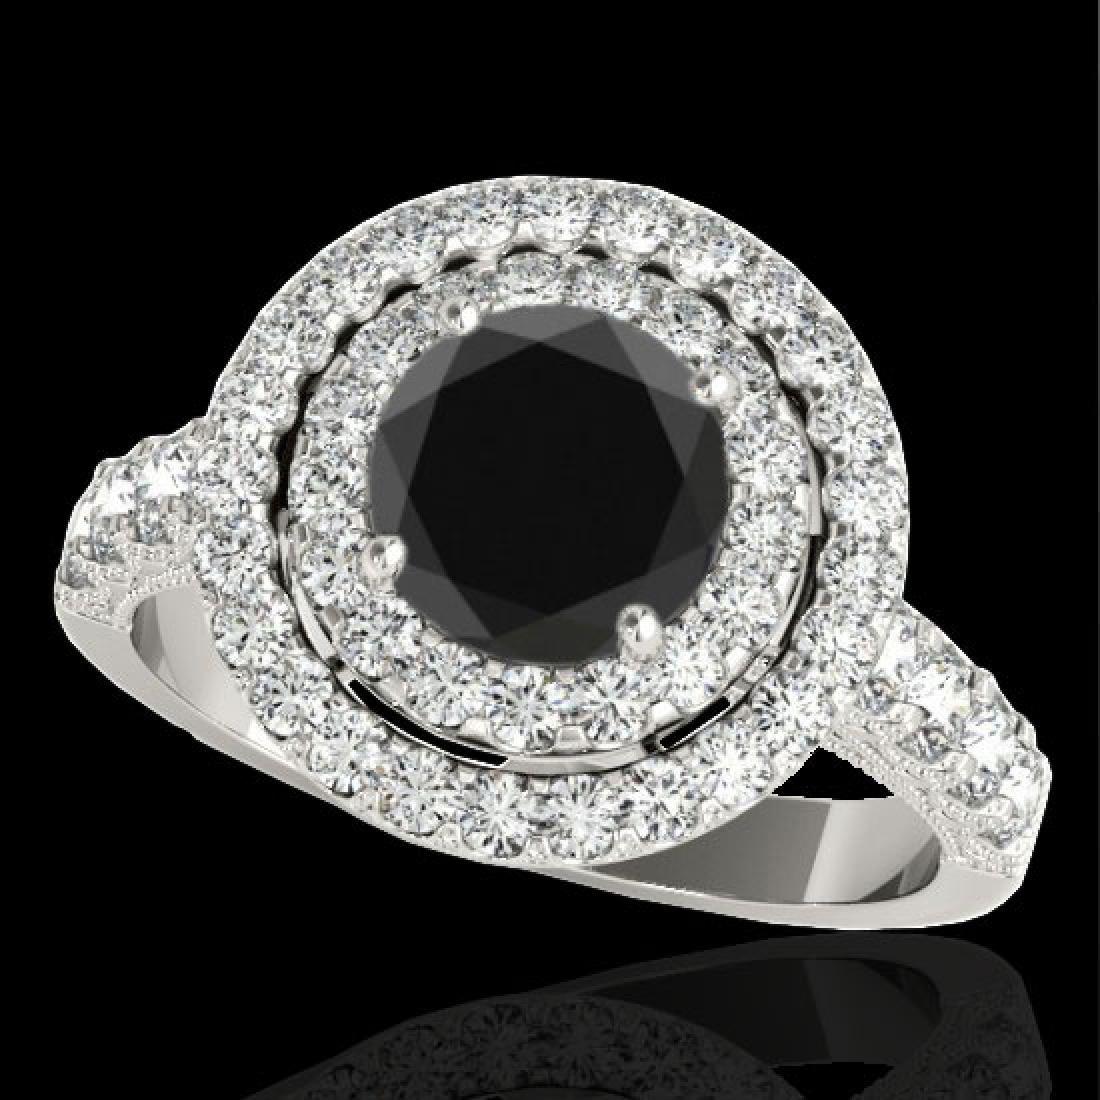 3 CTW Certified VS Black Diamond Solitaire Halo Ring